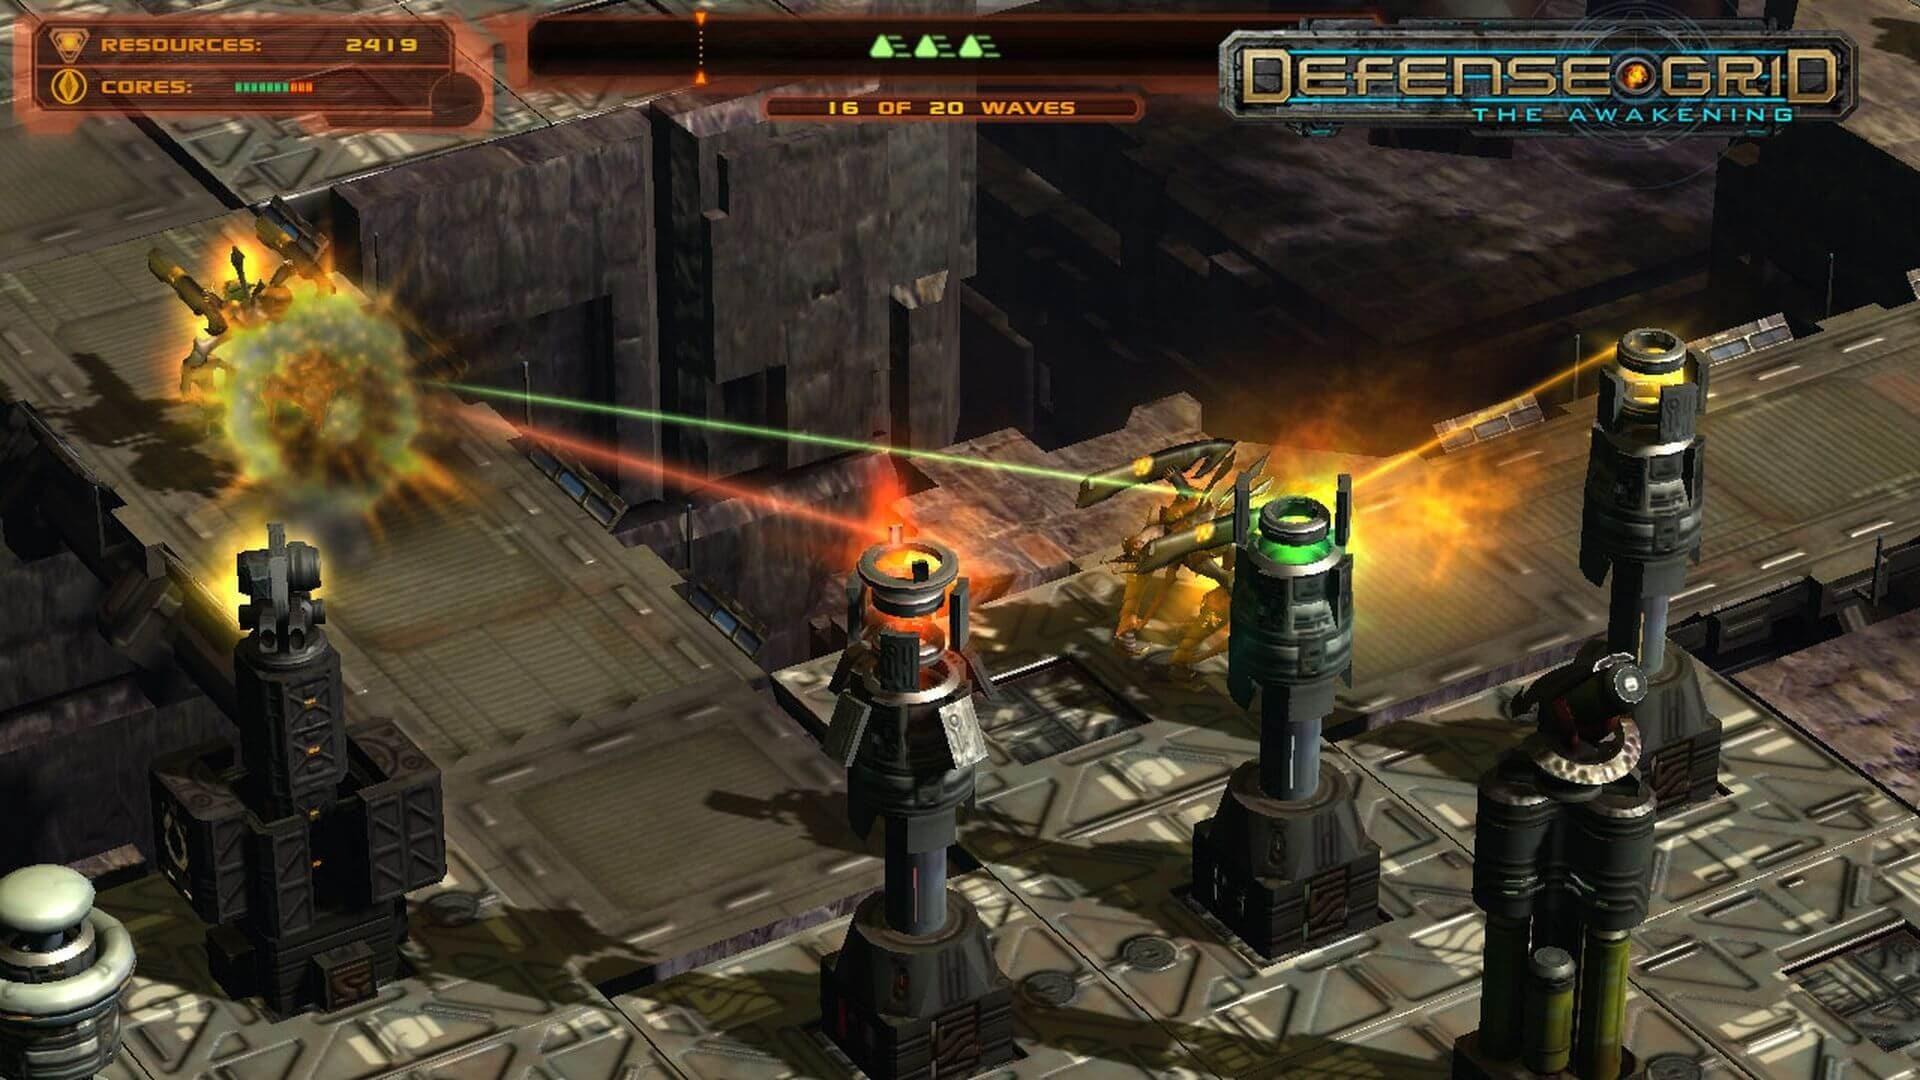 В EGS началась раздача Defense Grid: The Awakening — игры в жанре Tower Defense